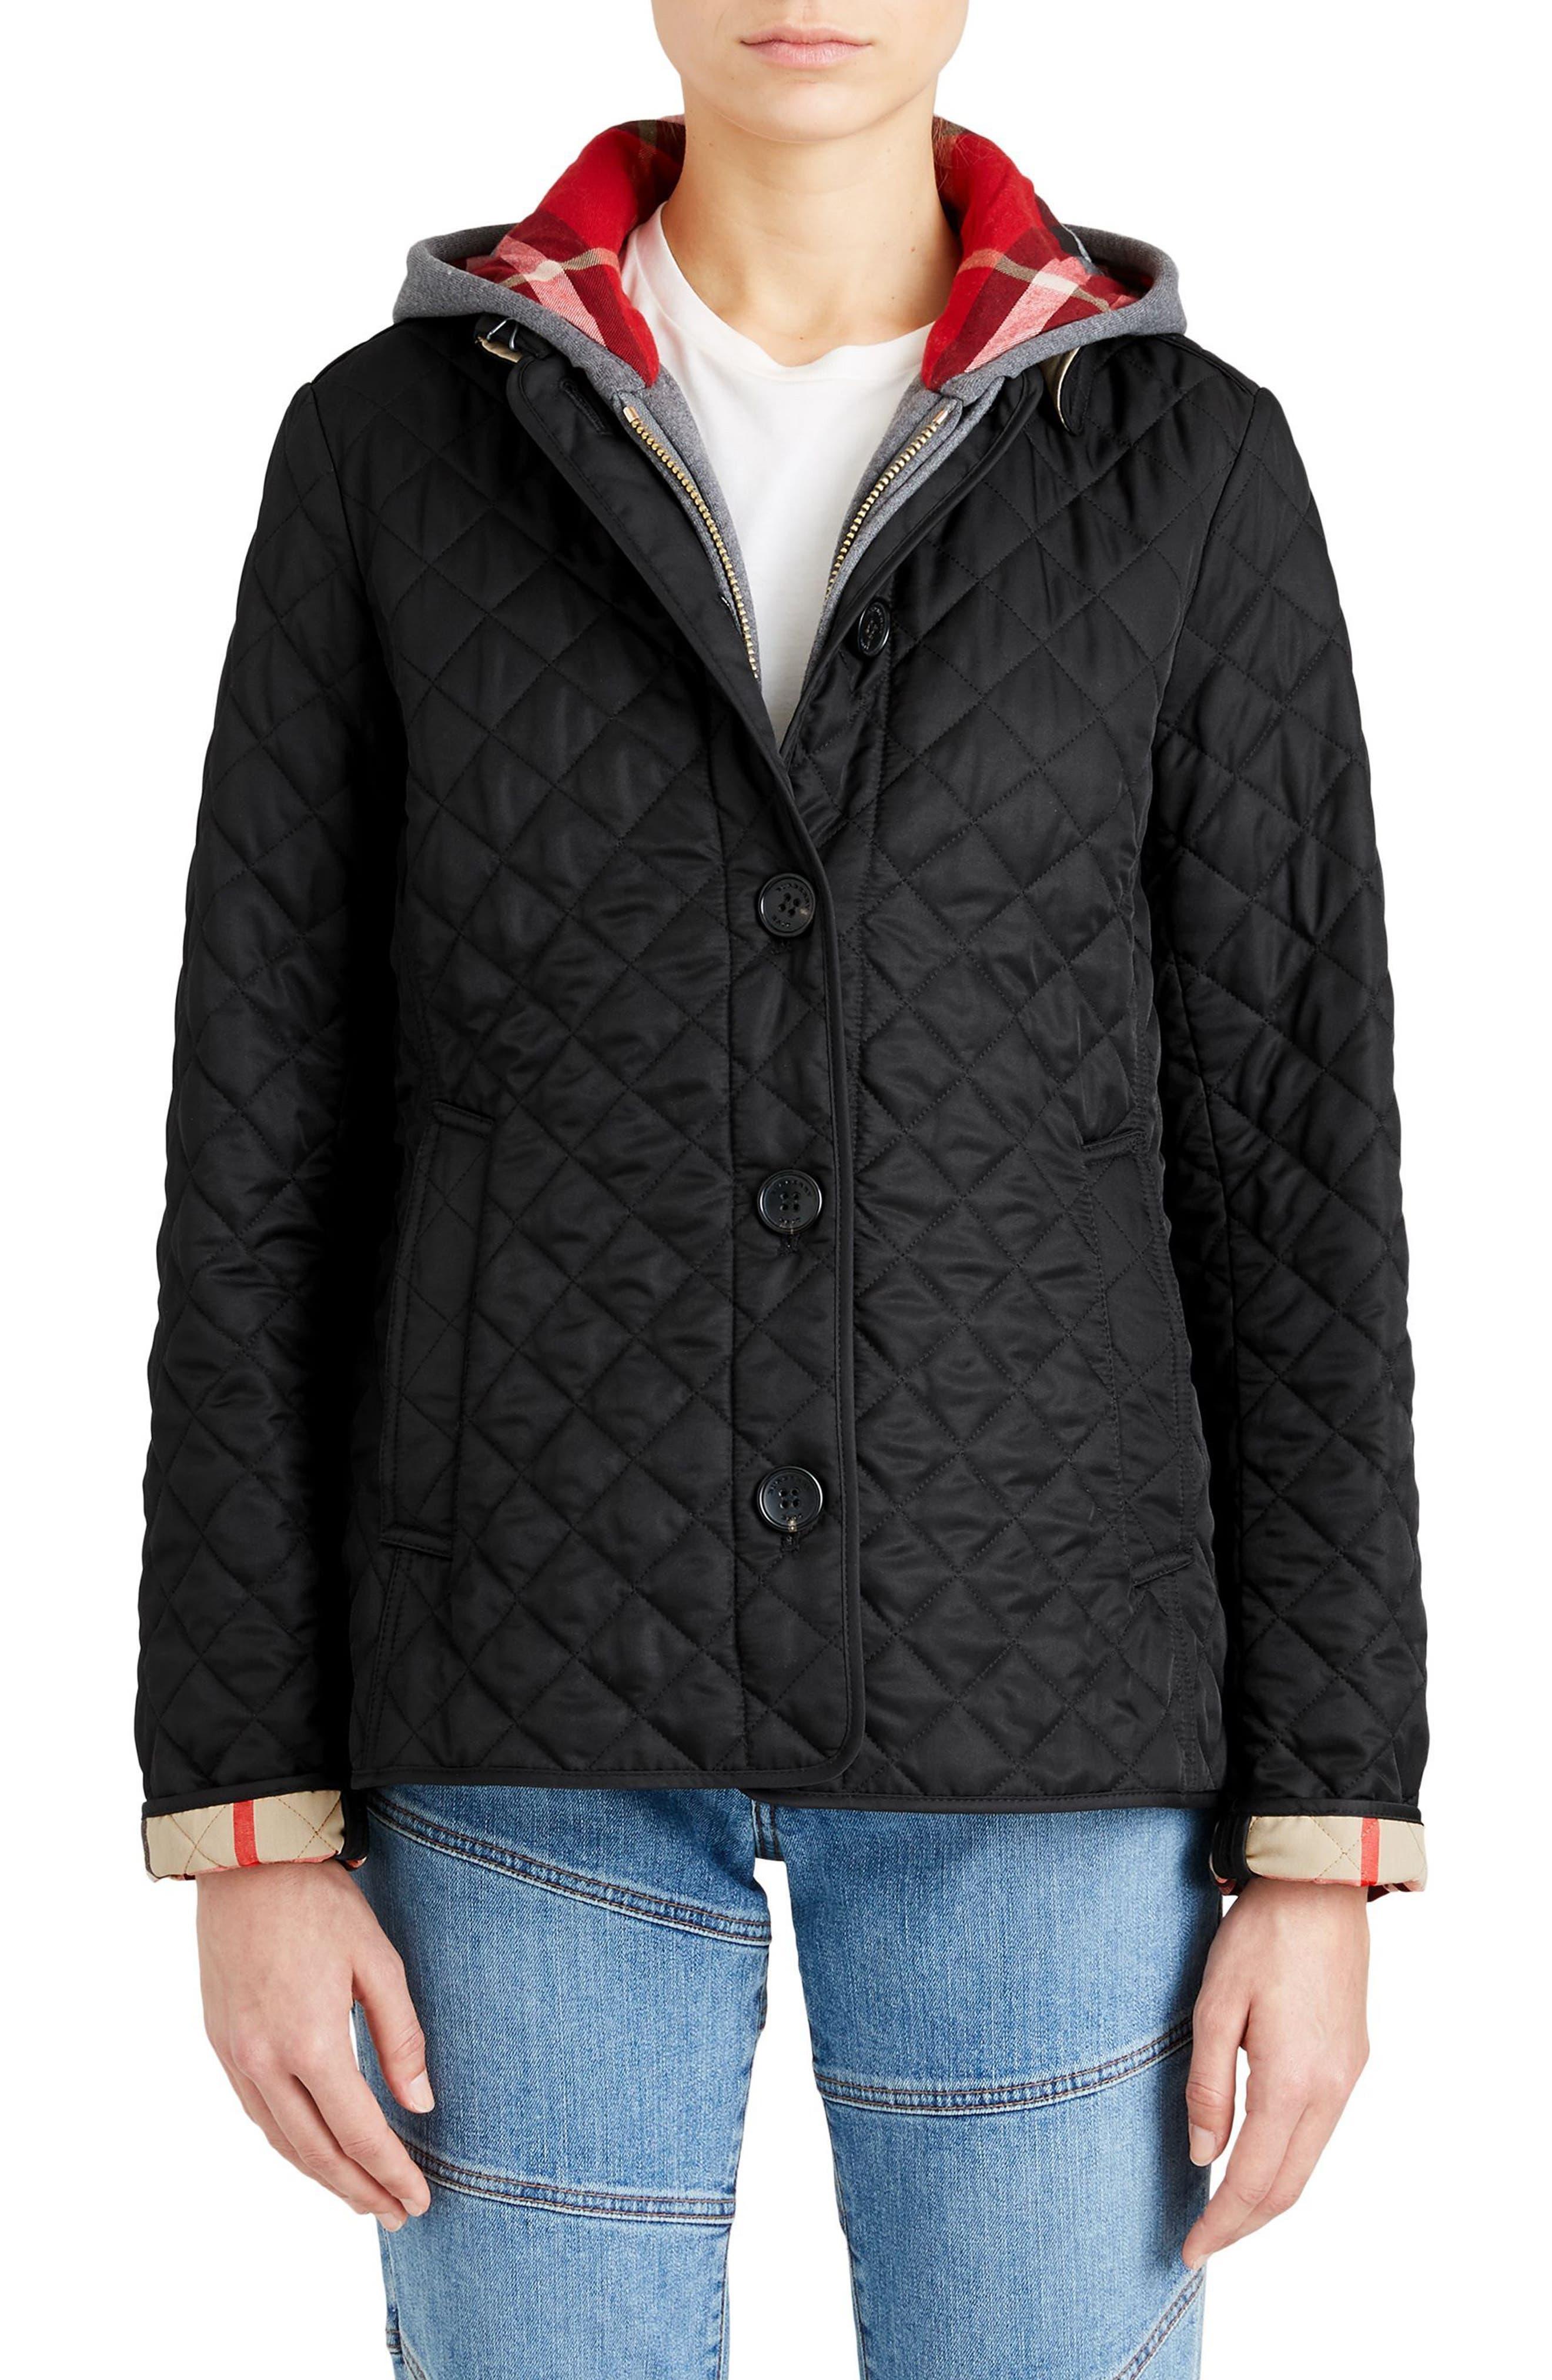 Ashurst Quilted Jacket,                             Main thumbnail 1, color,                             BLACK